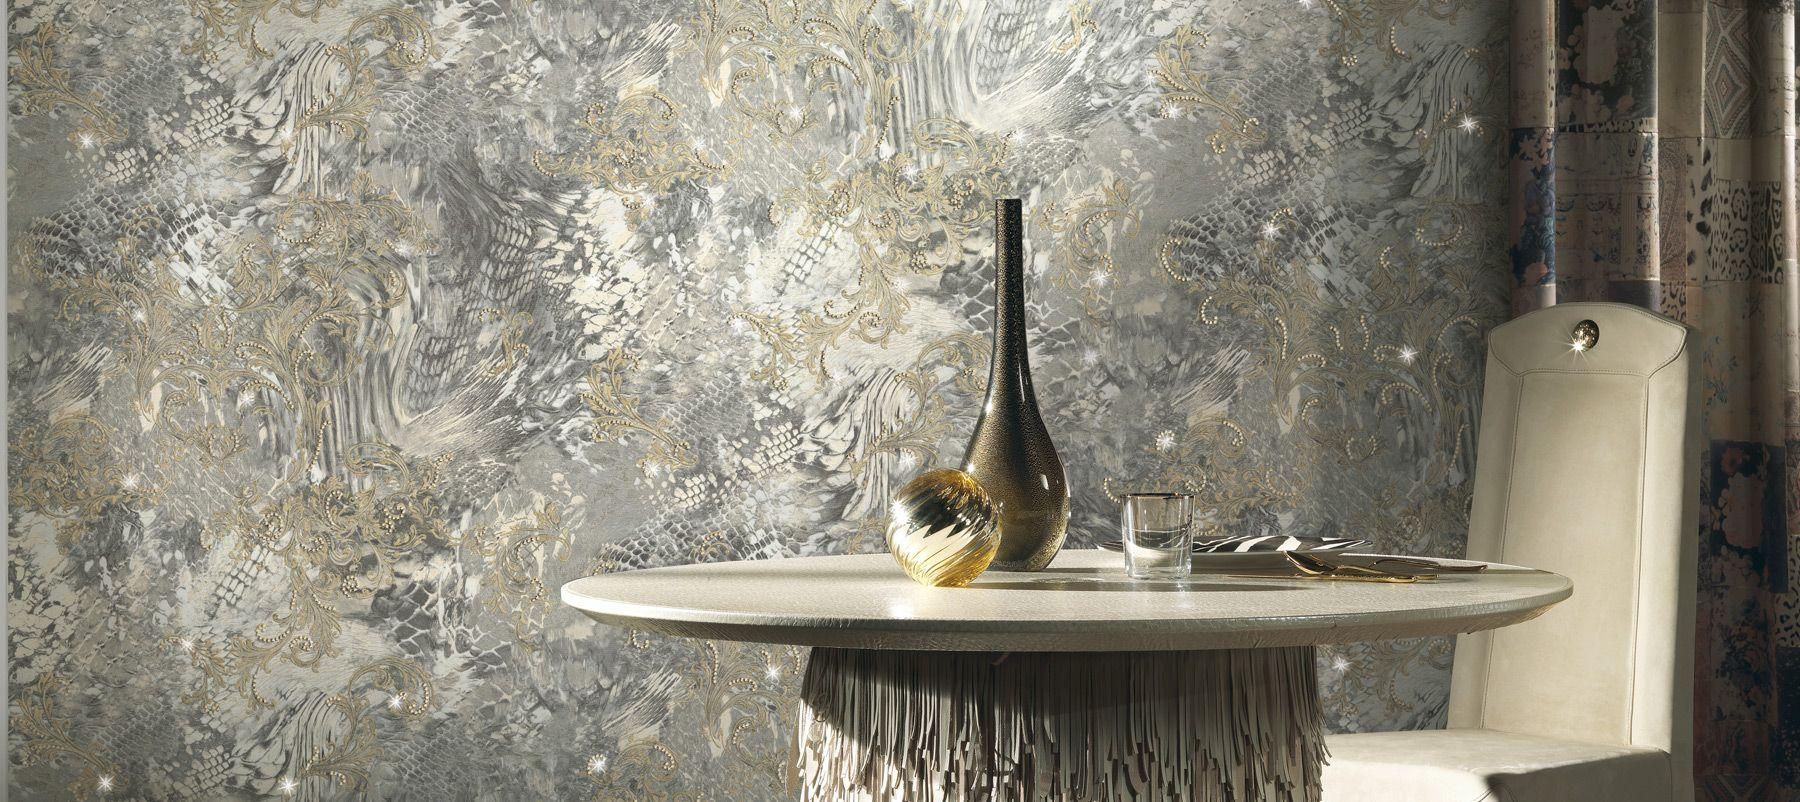 Claudia Schiffer Wallpaper Panel With Crystals   Roberto Cavalli 1800x802